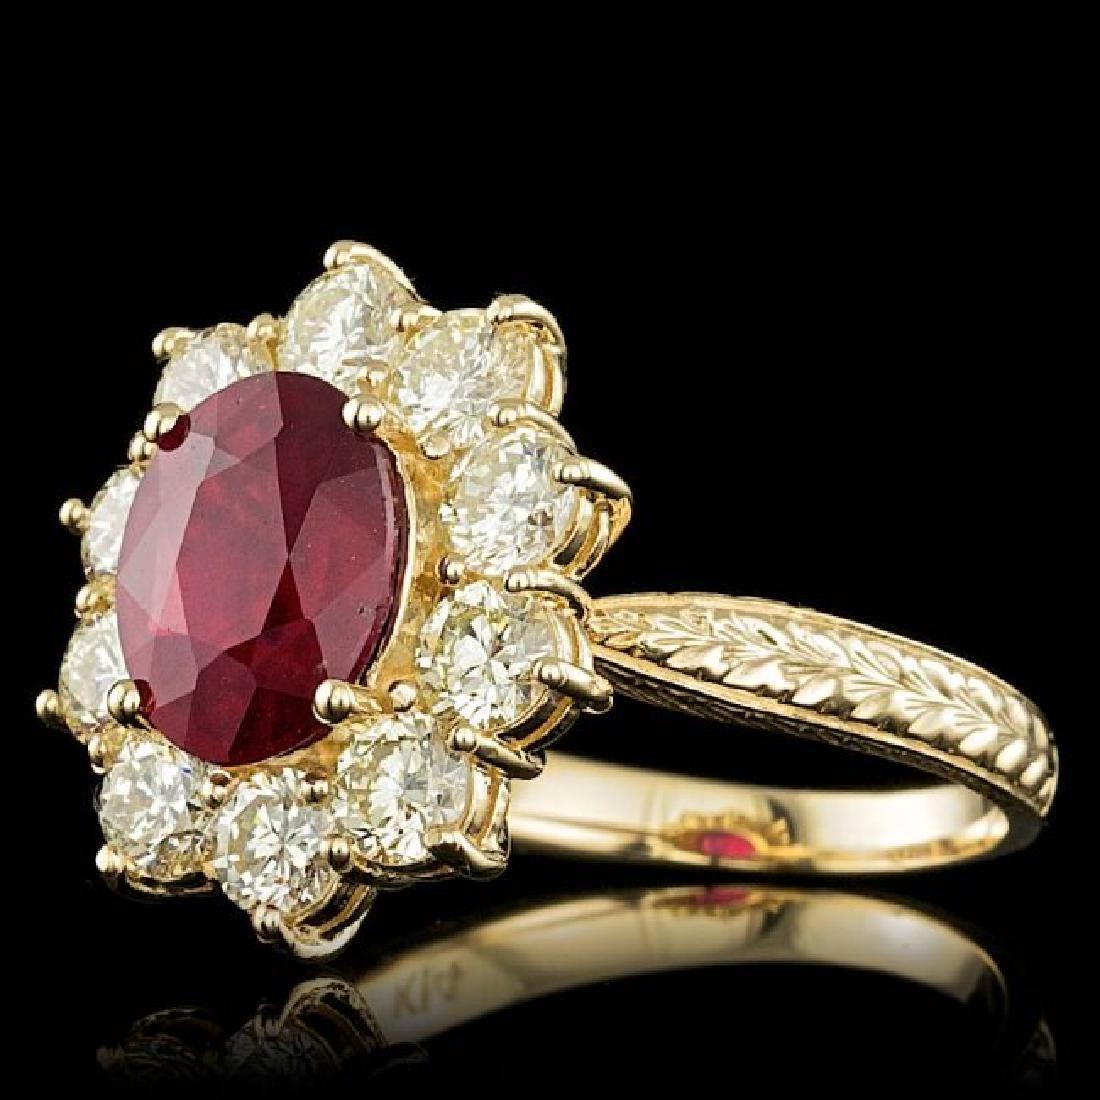 14k Yellow Gold 3.00ct Ruby 2.10ct Diamond Ring - 2